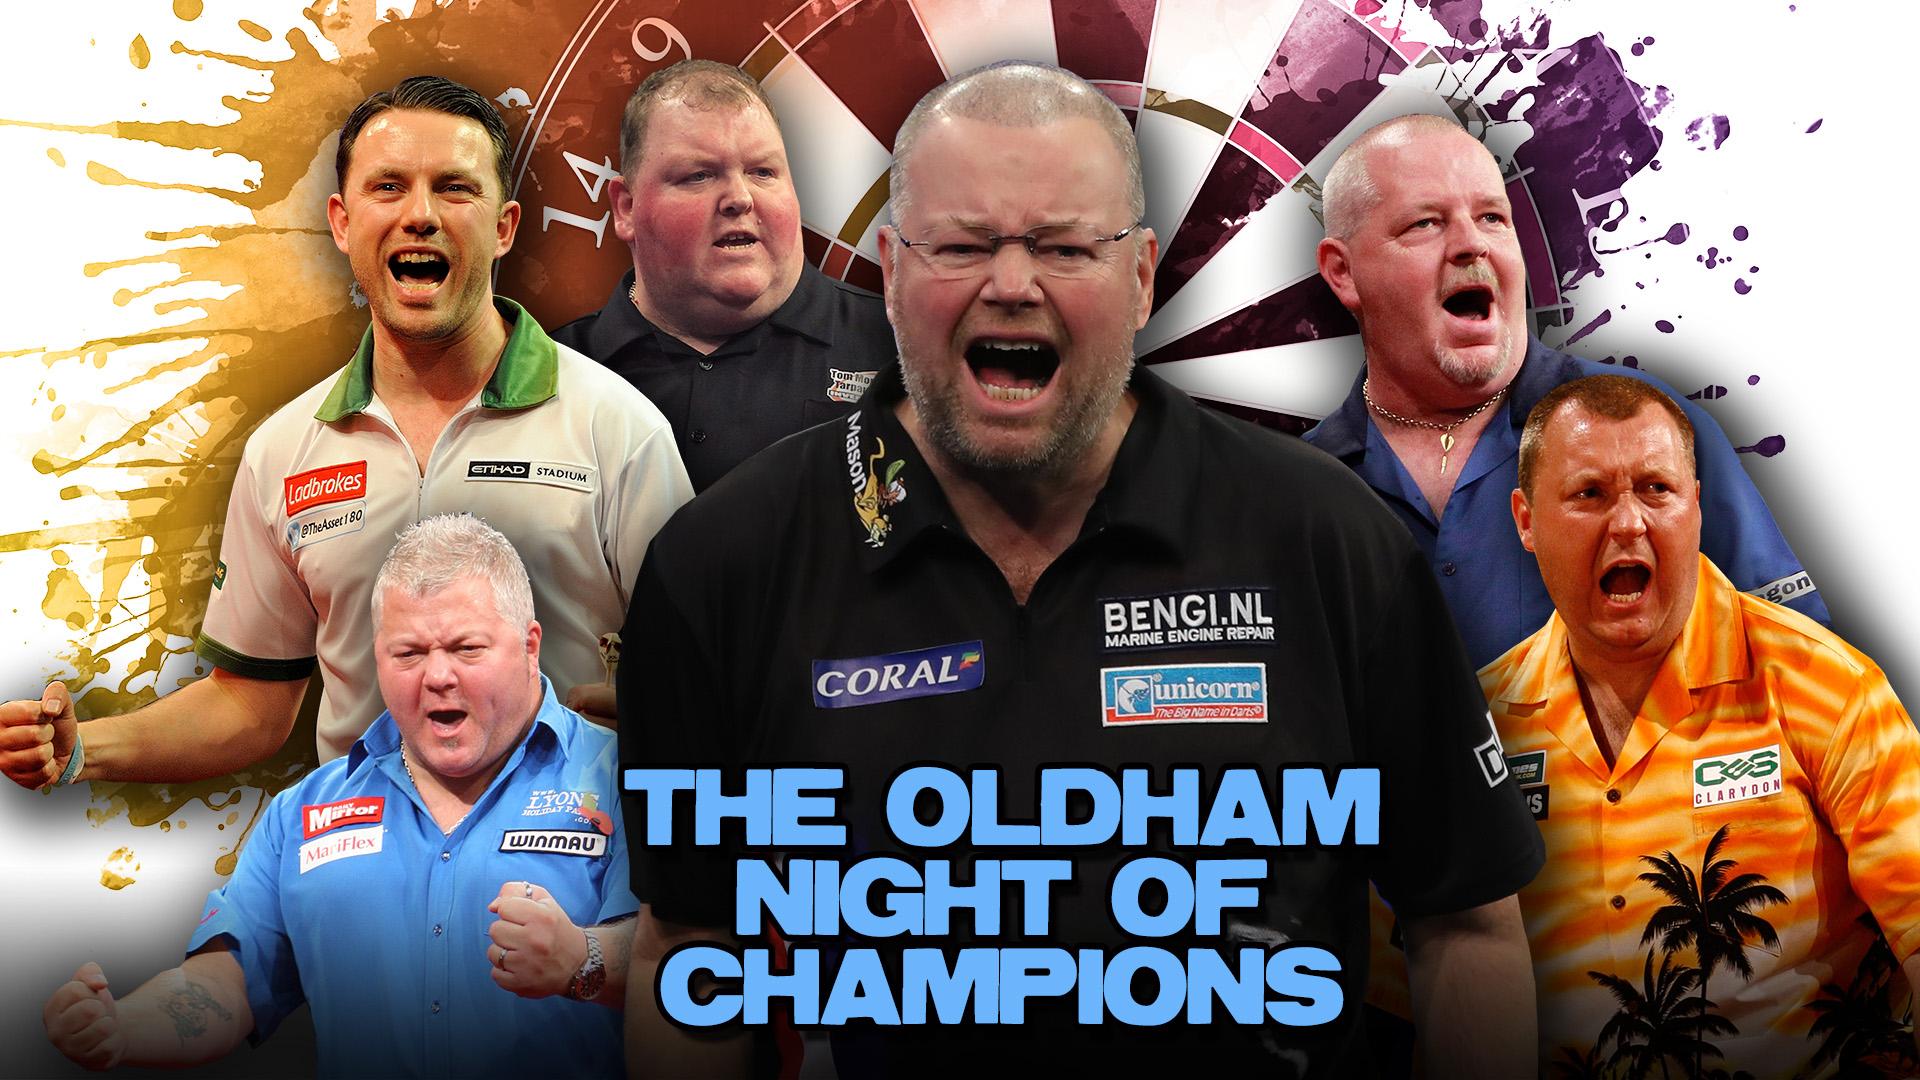 Oldham Night of Champions